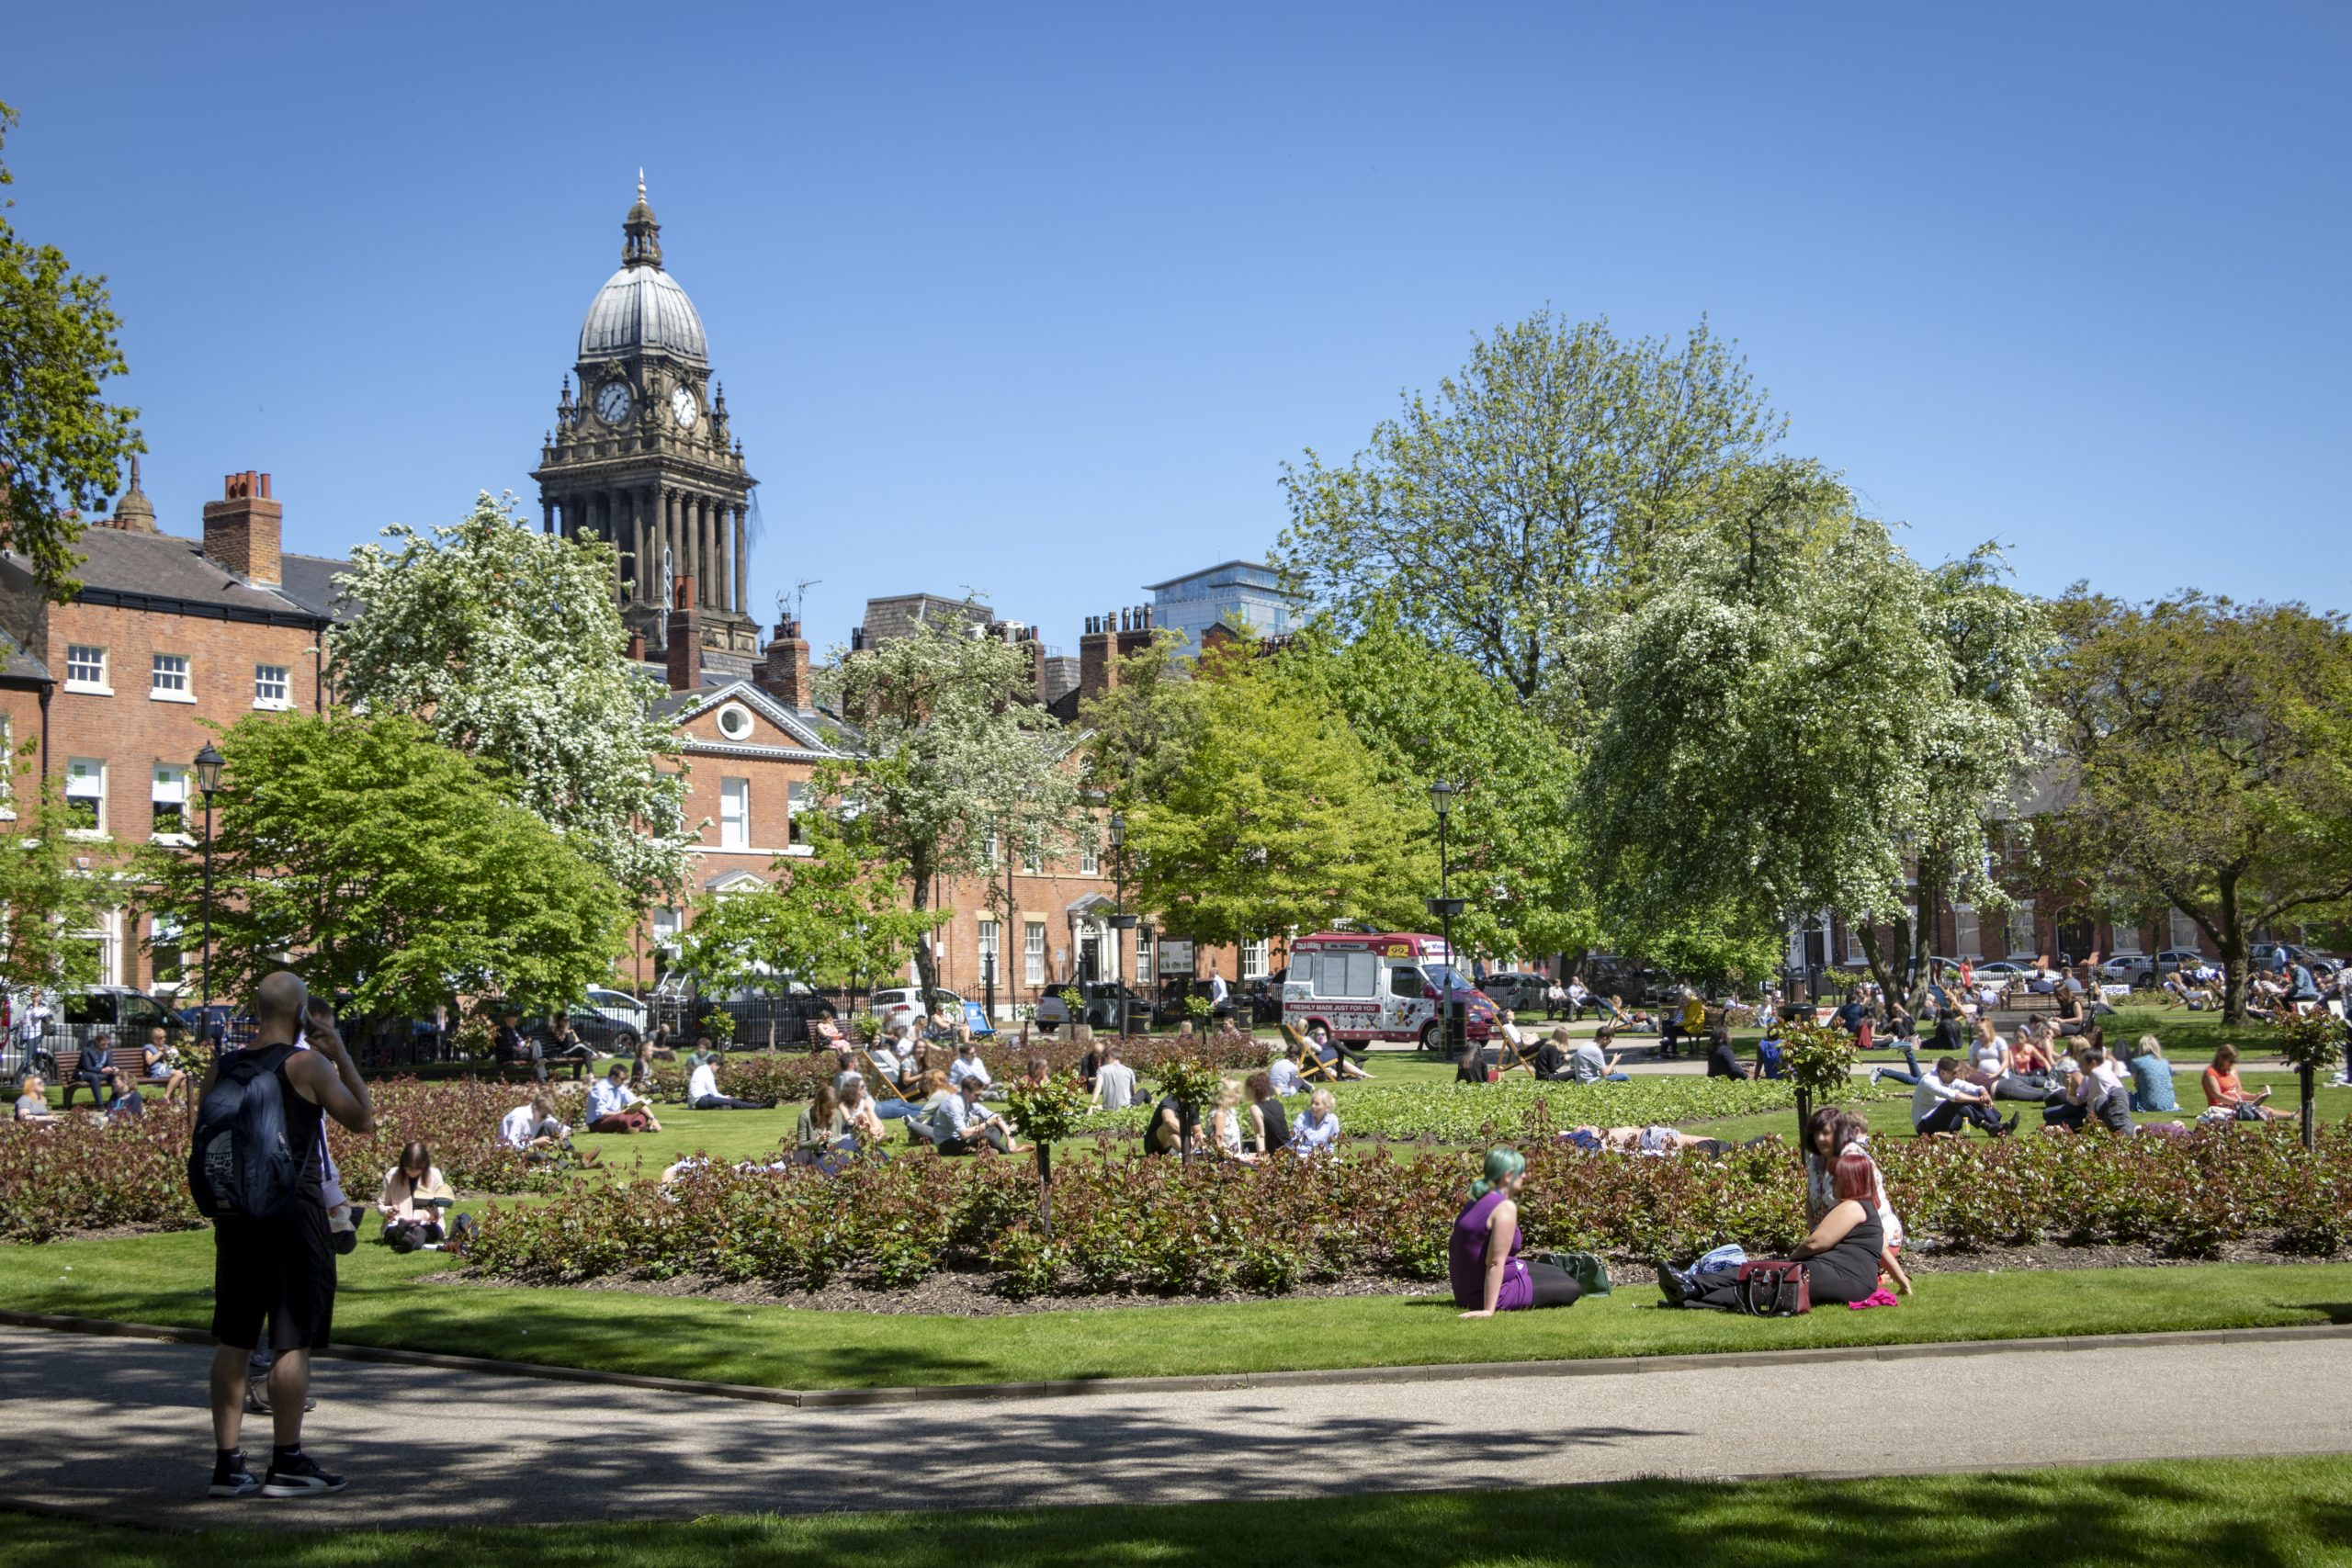 Park Square - credit Carl Milner for Leeds City Council